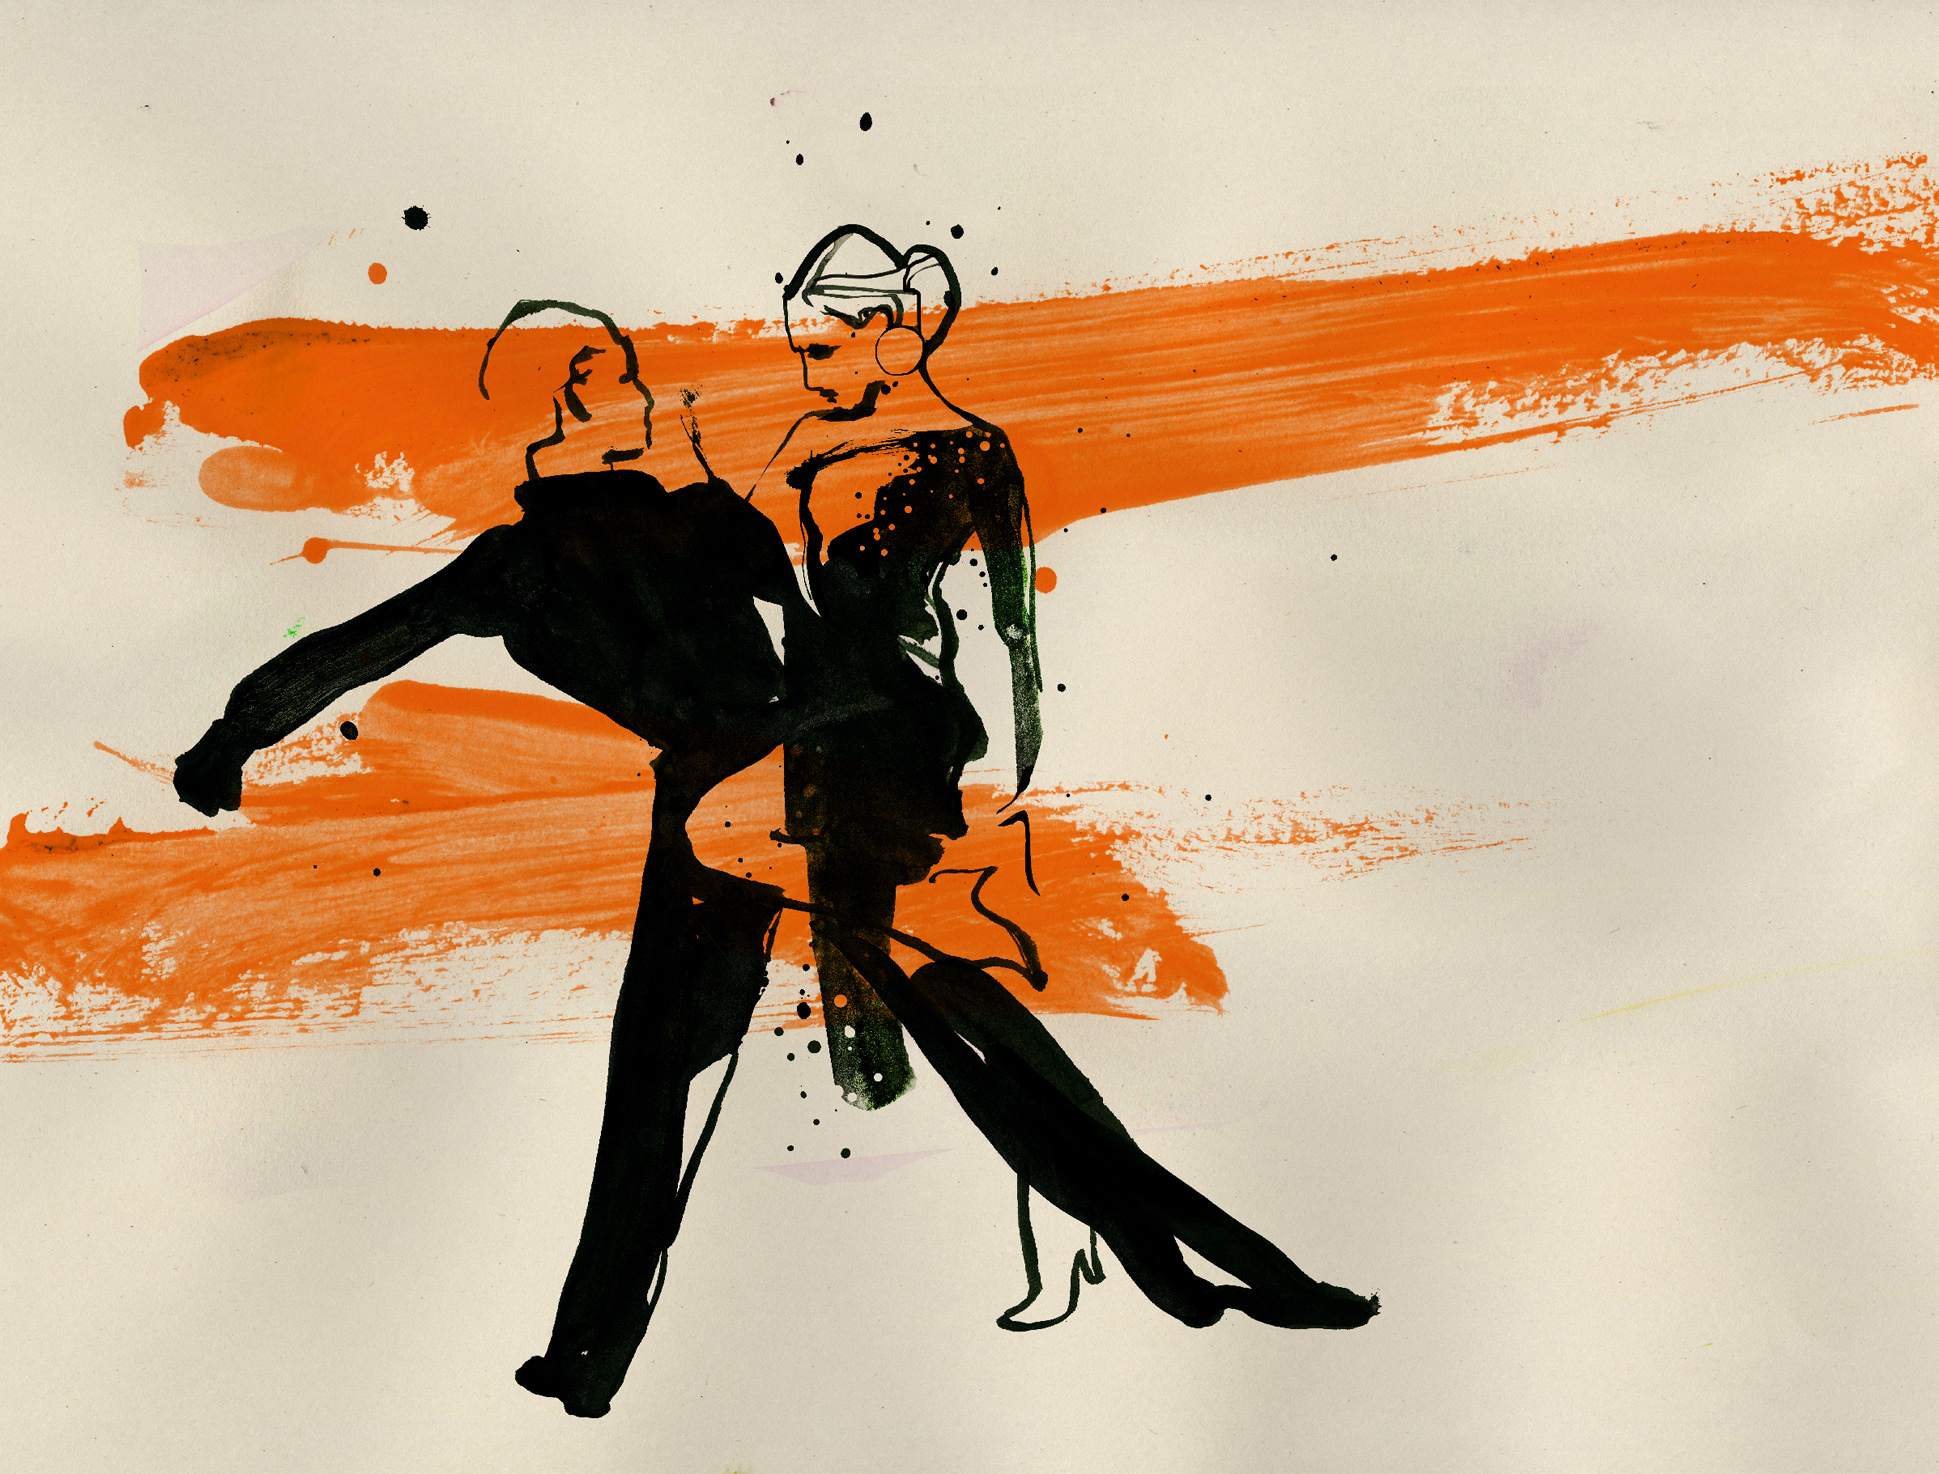 stina-persson-ink-moce-dance-wear-latin.jpg